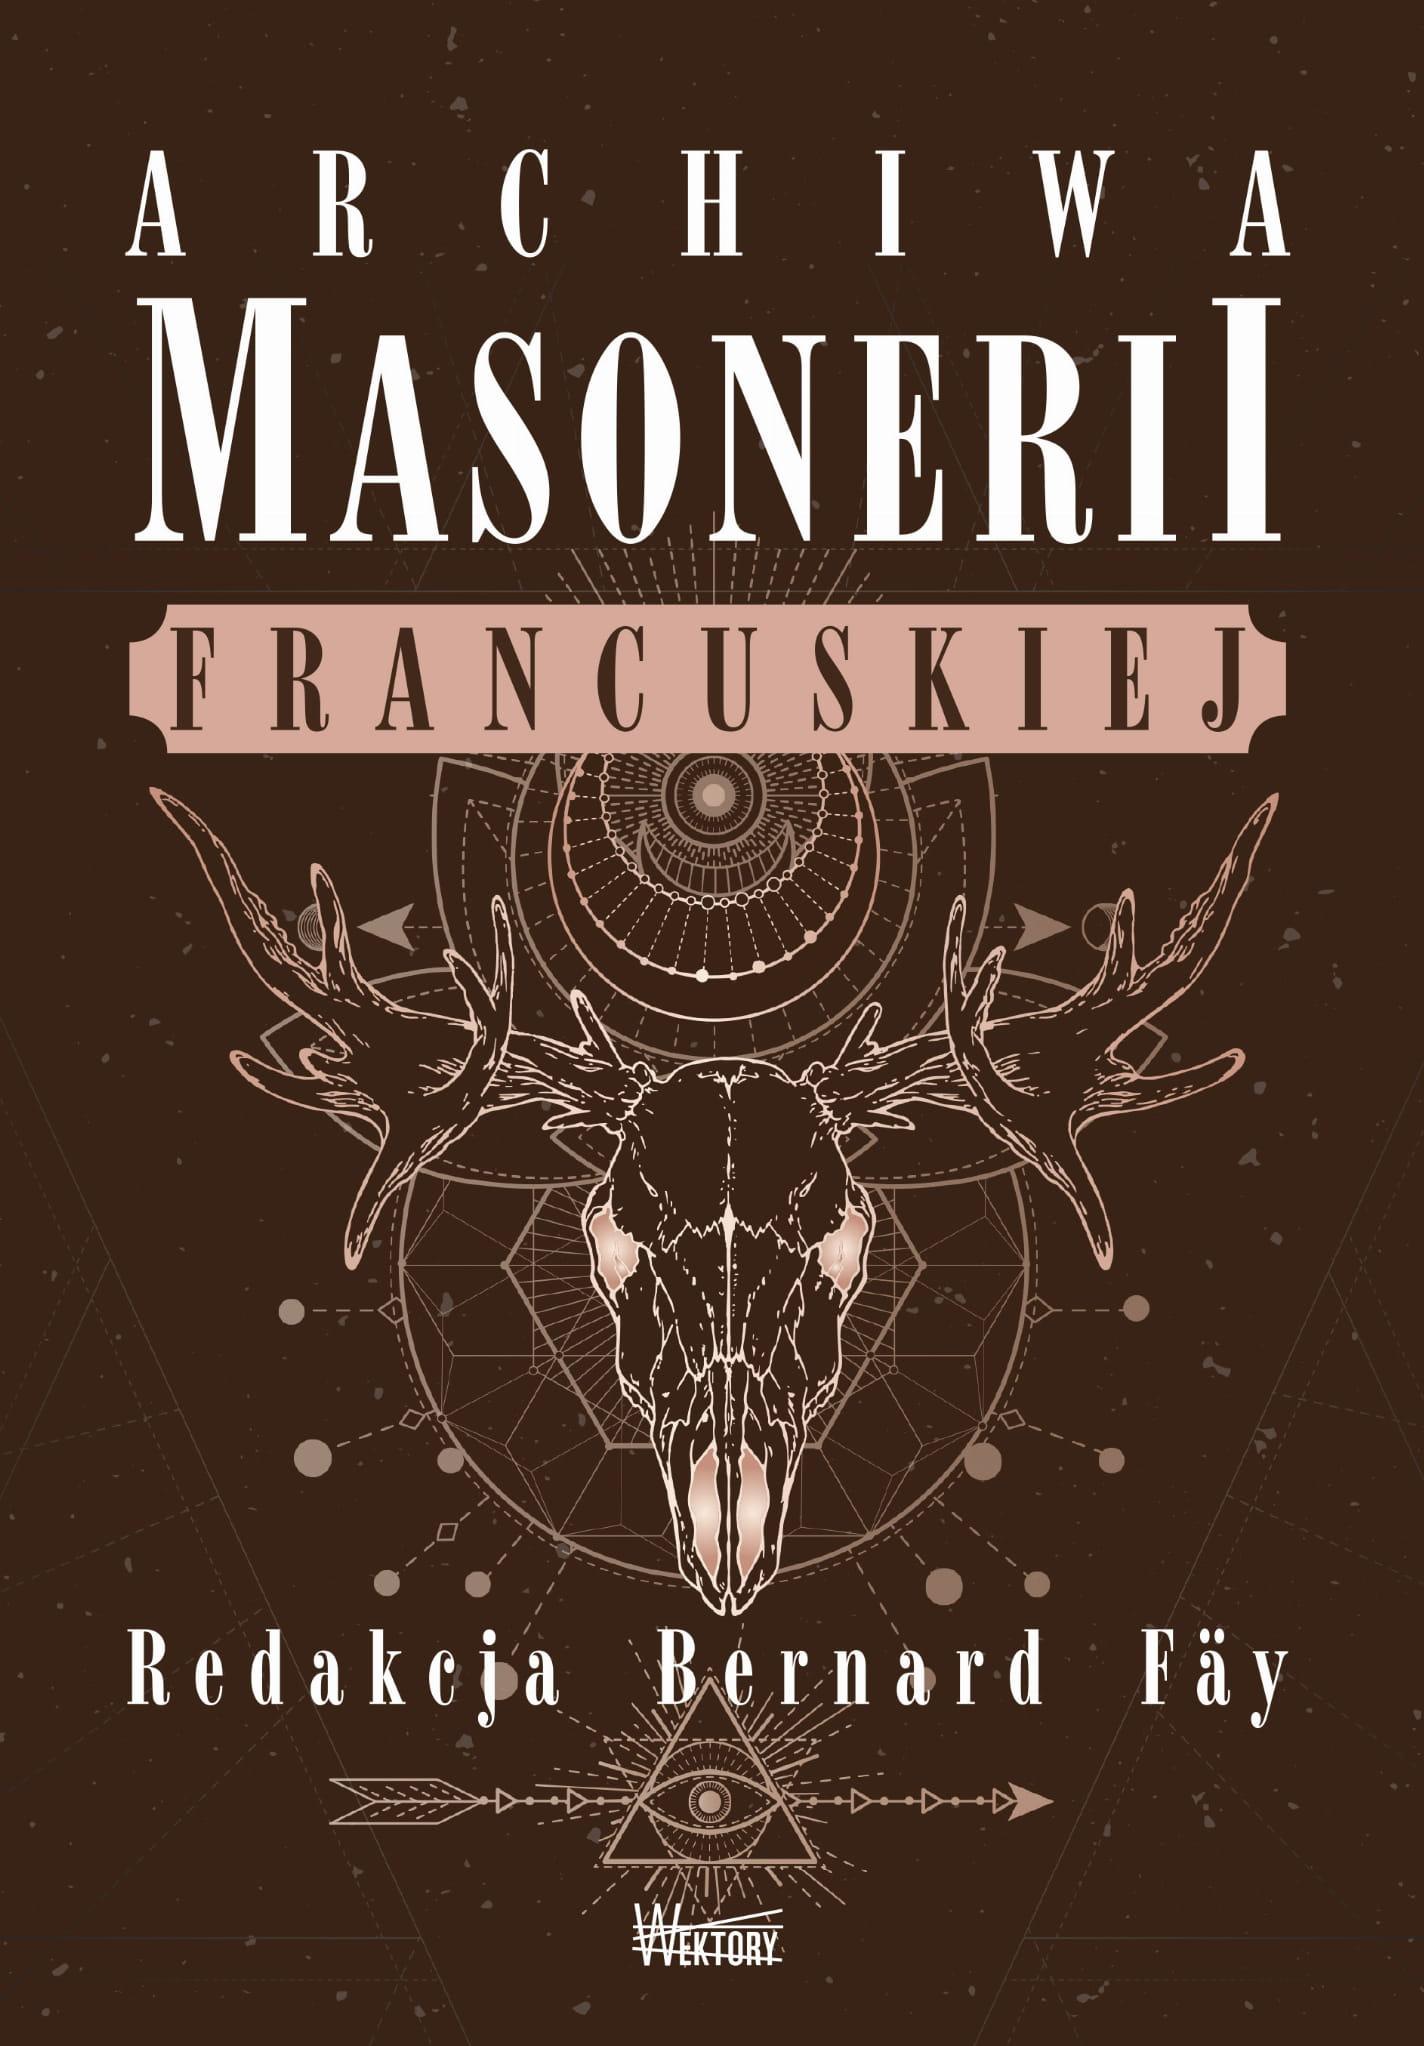 Archiwa masonerii francuskiej - Redakcja Bernard Faÿ